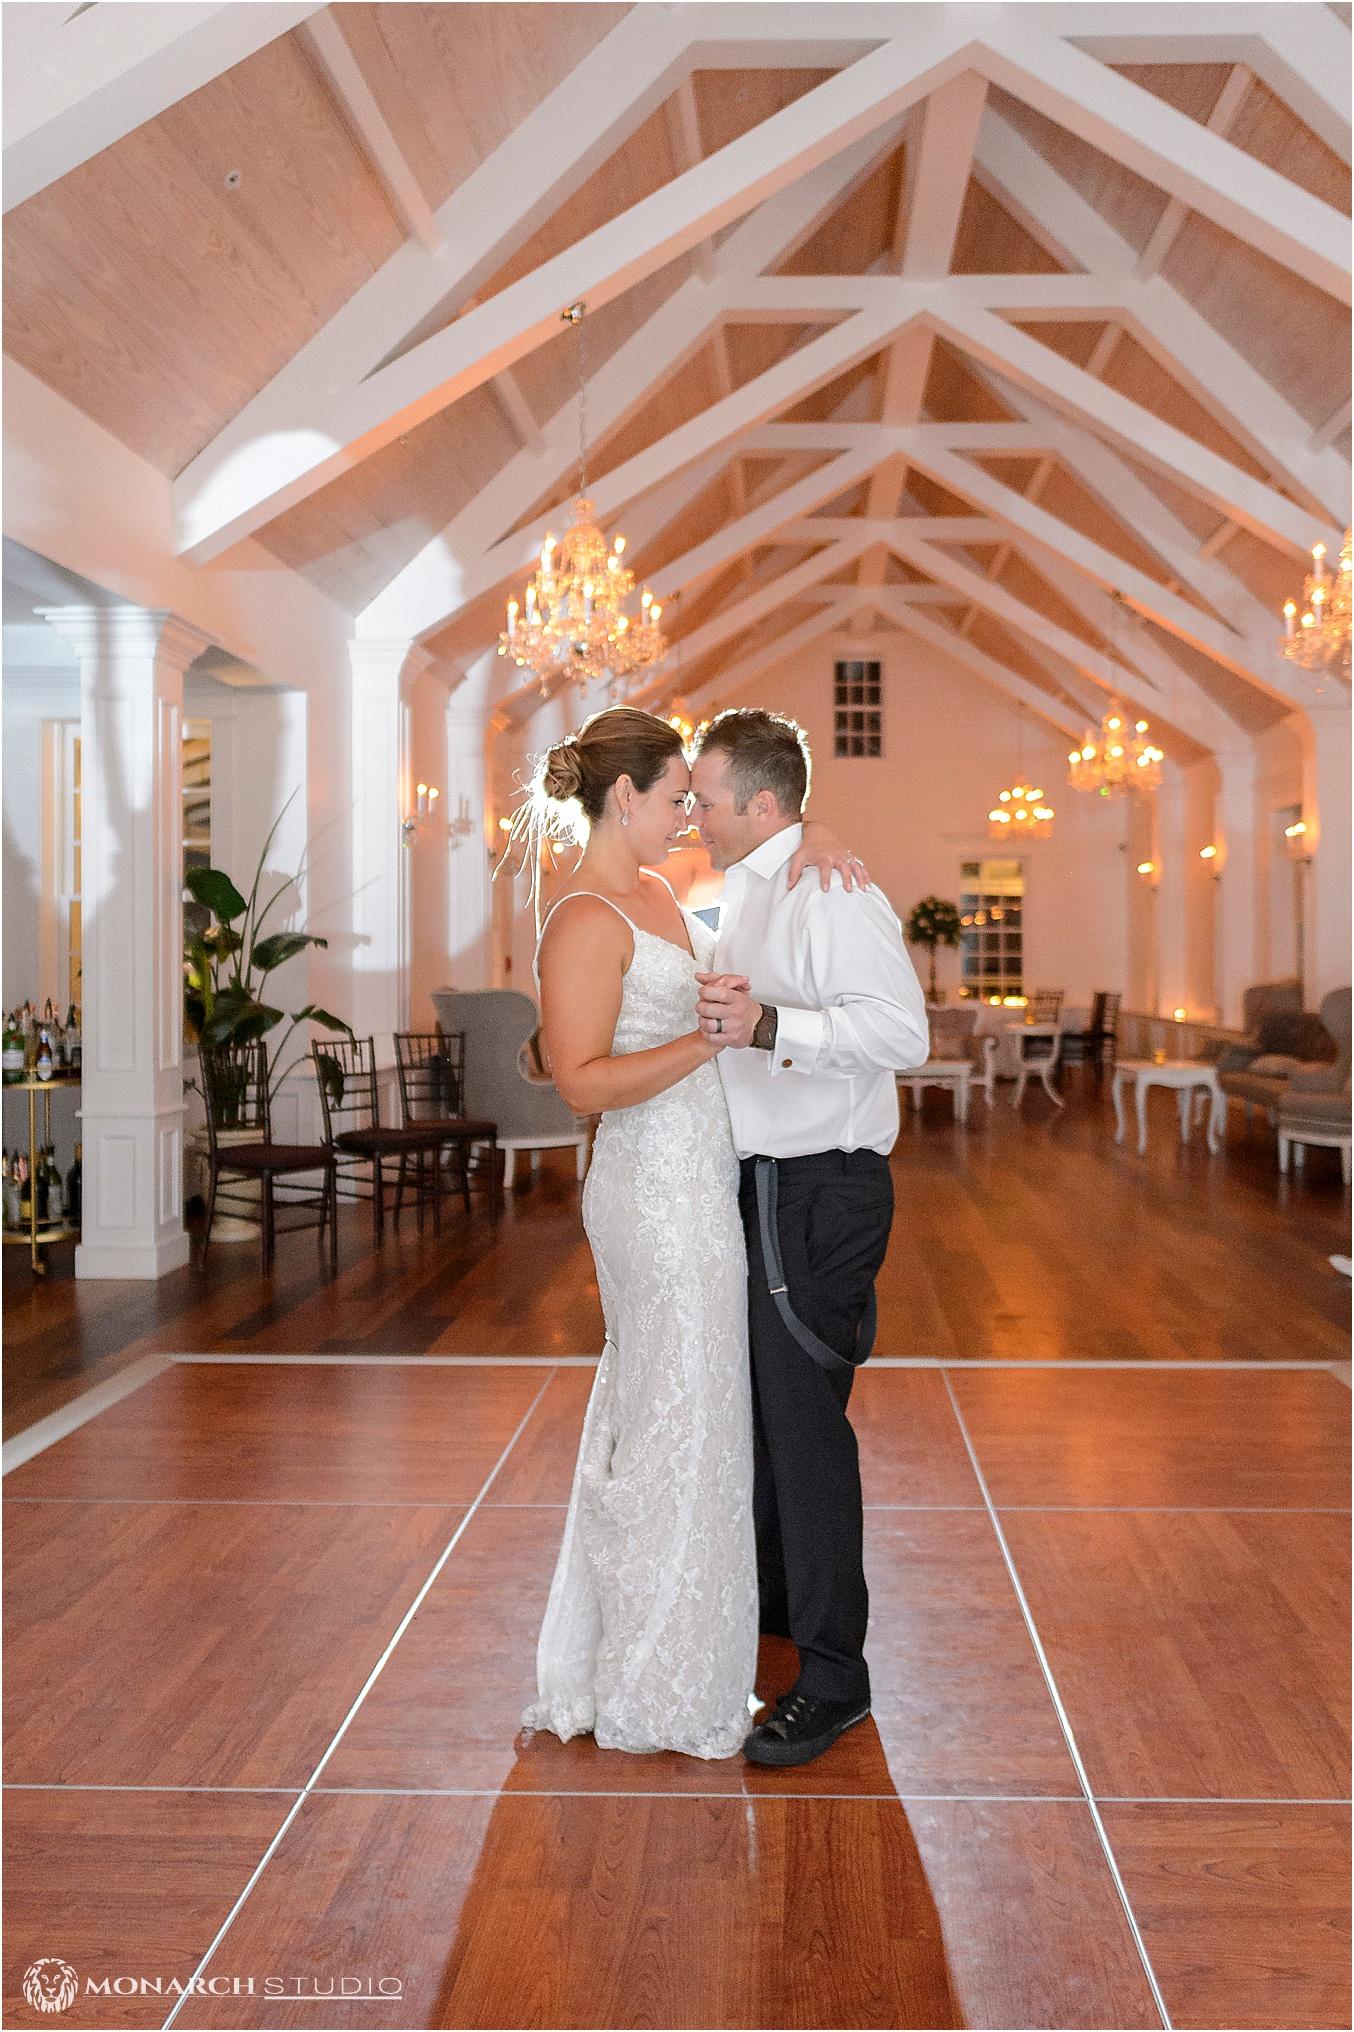 122-whiteroom-wedding-photographer-2019-05-22_0104.jpg